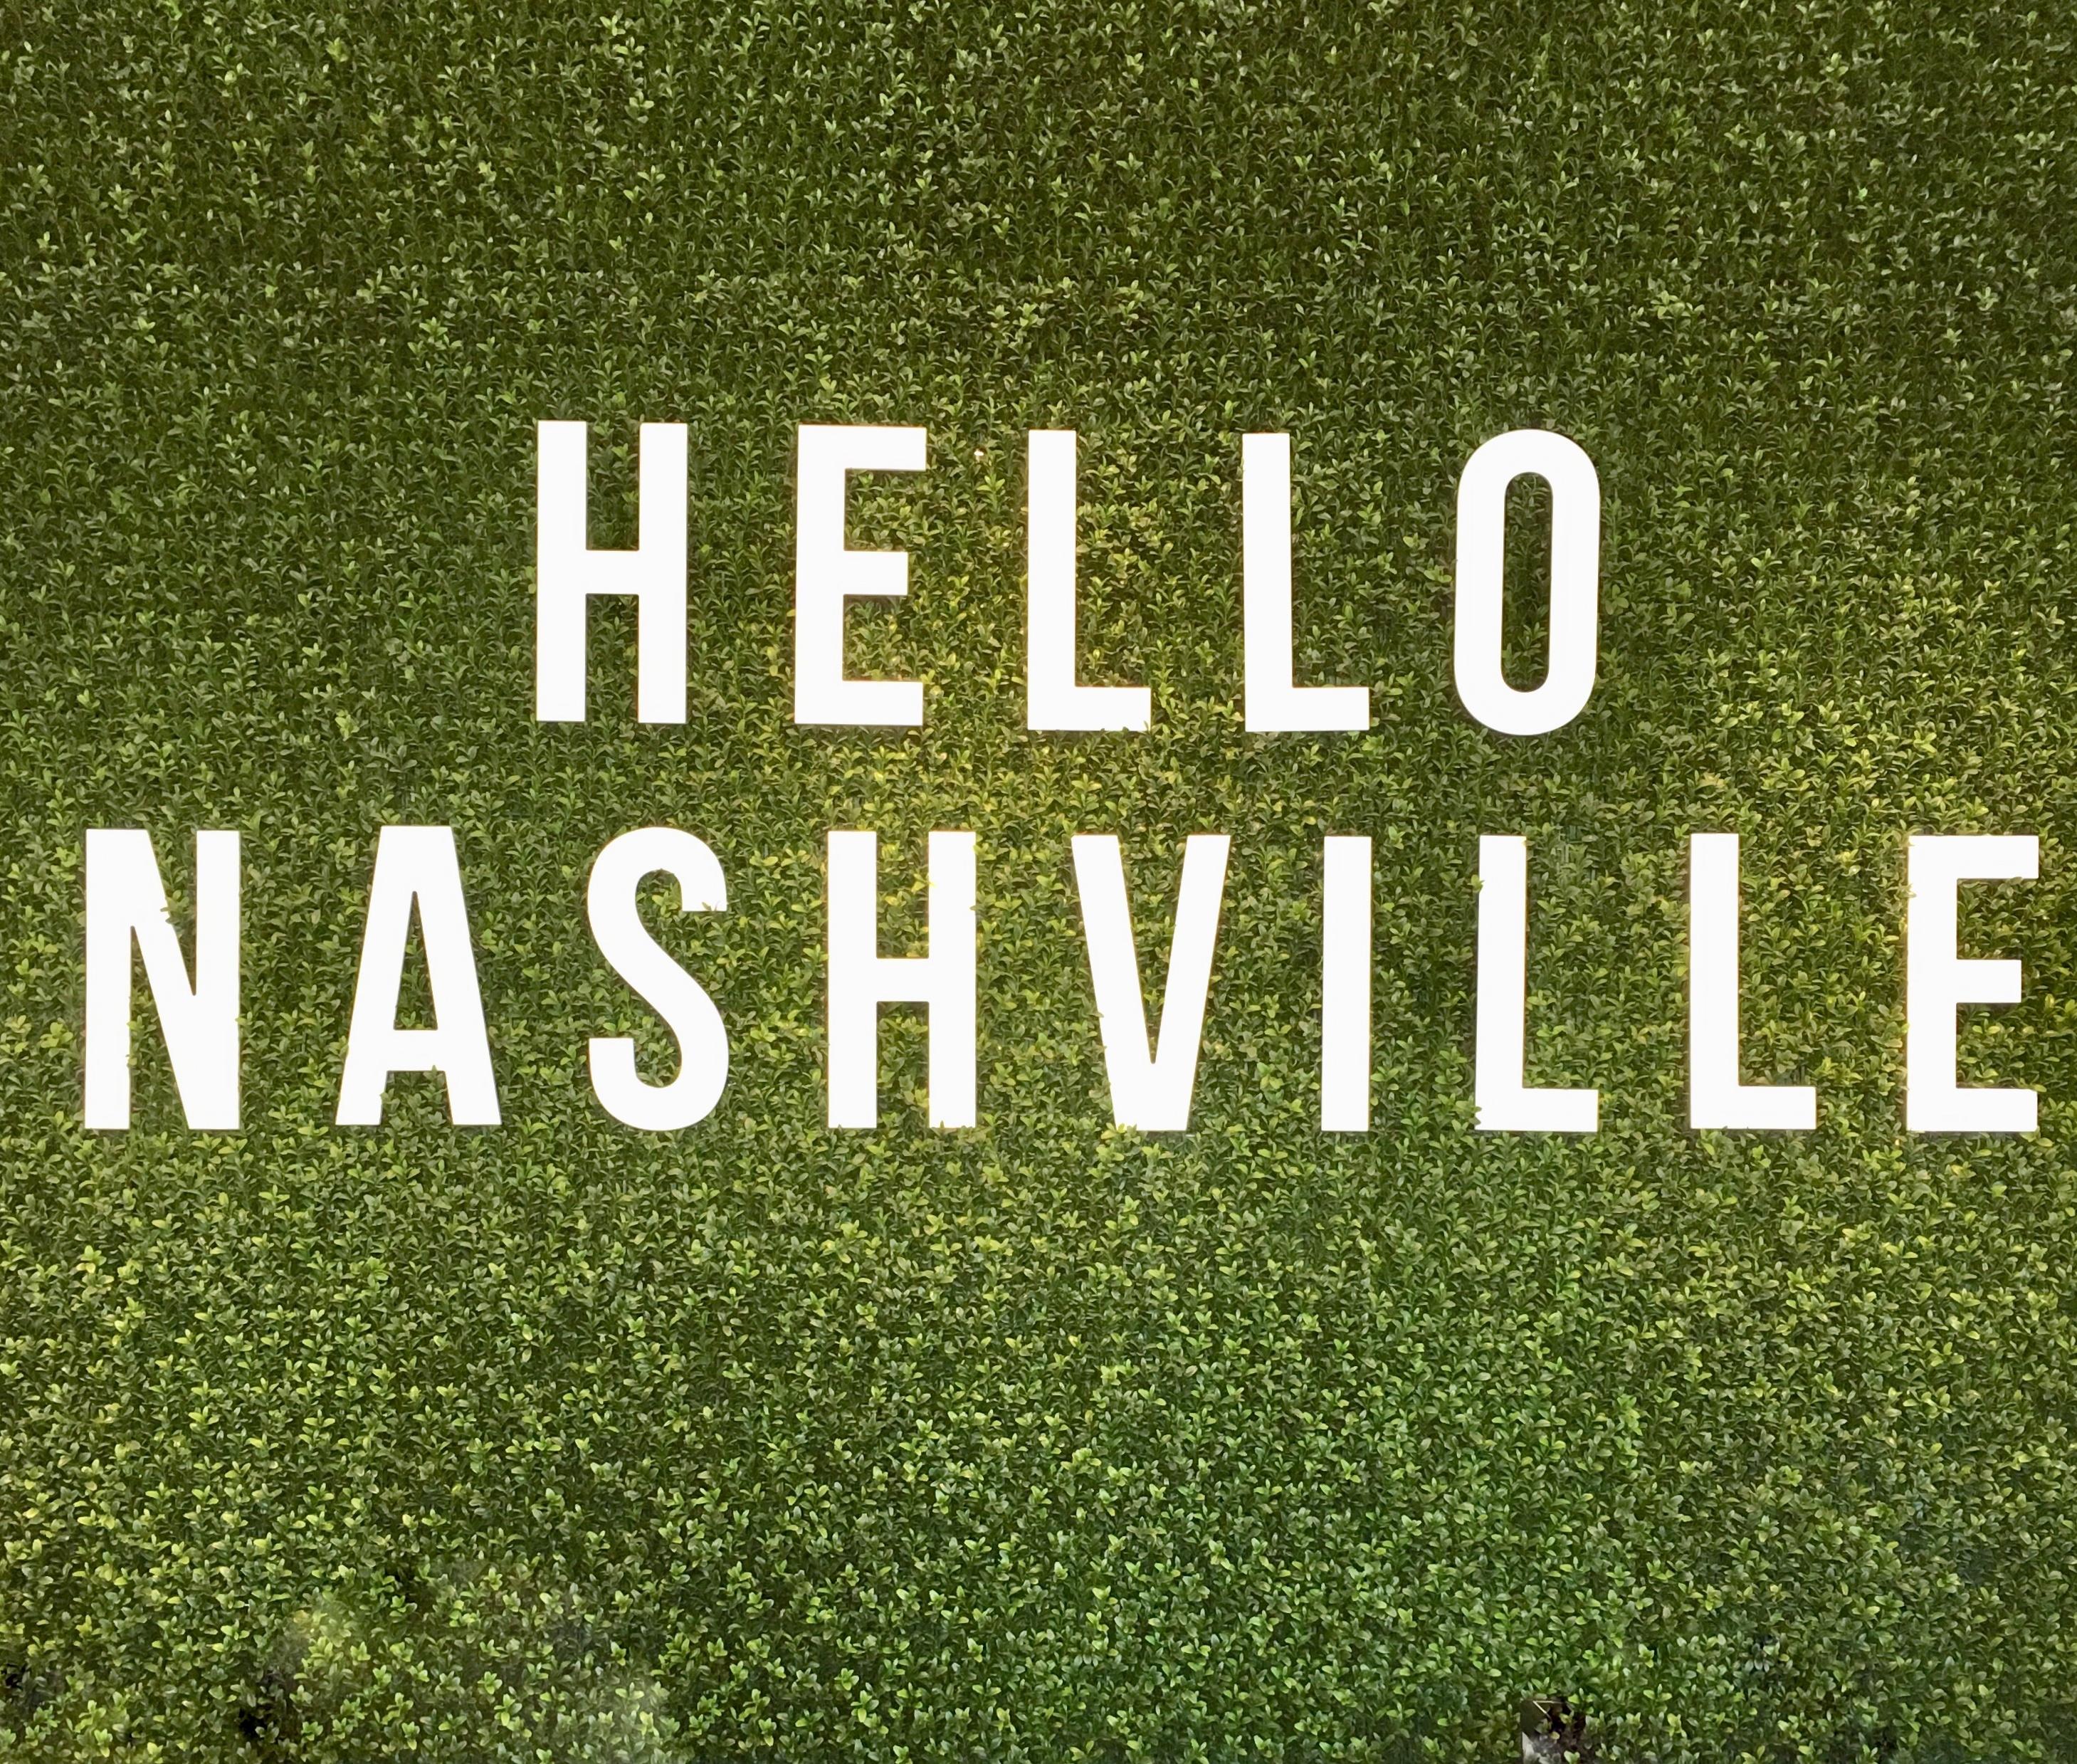 Nashville in 48 Hours!